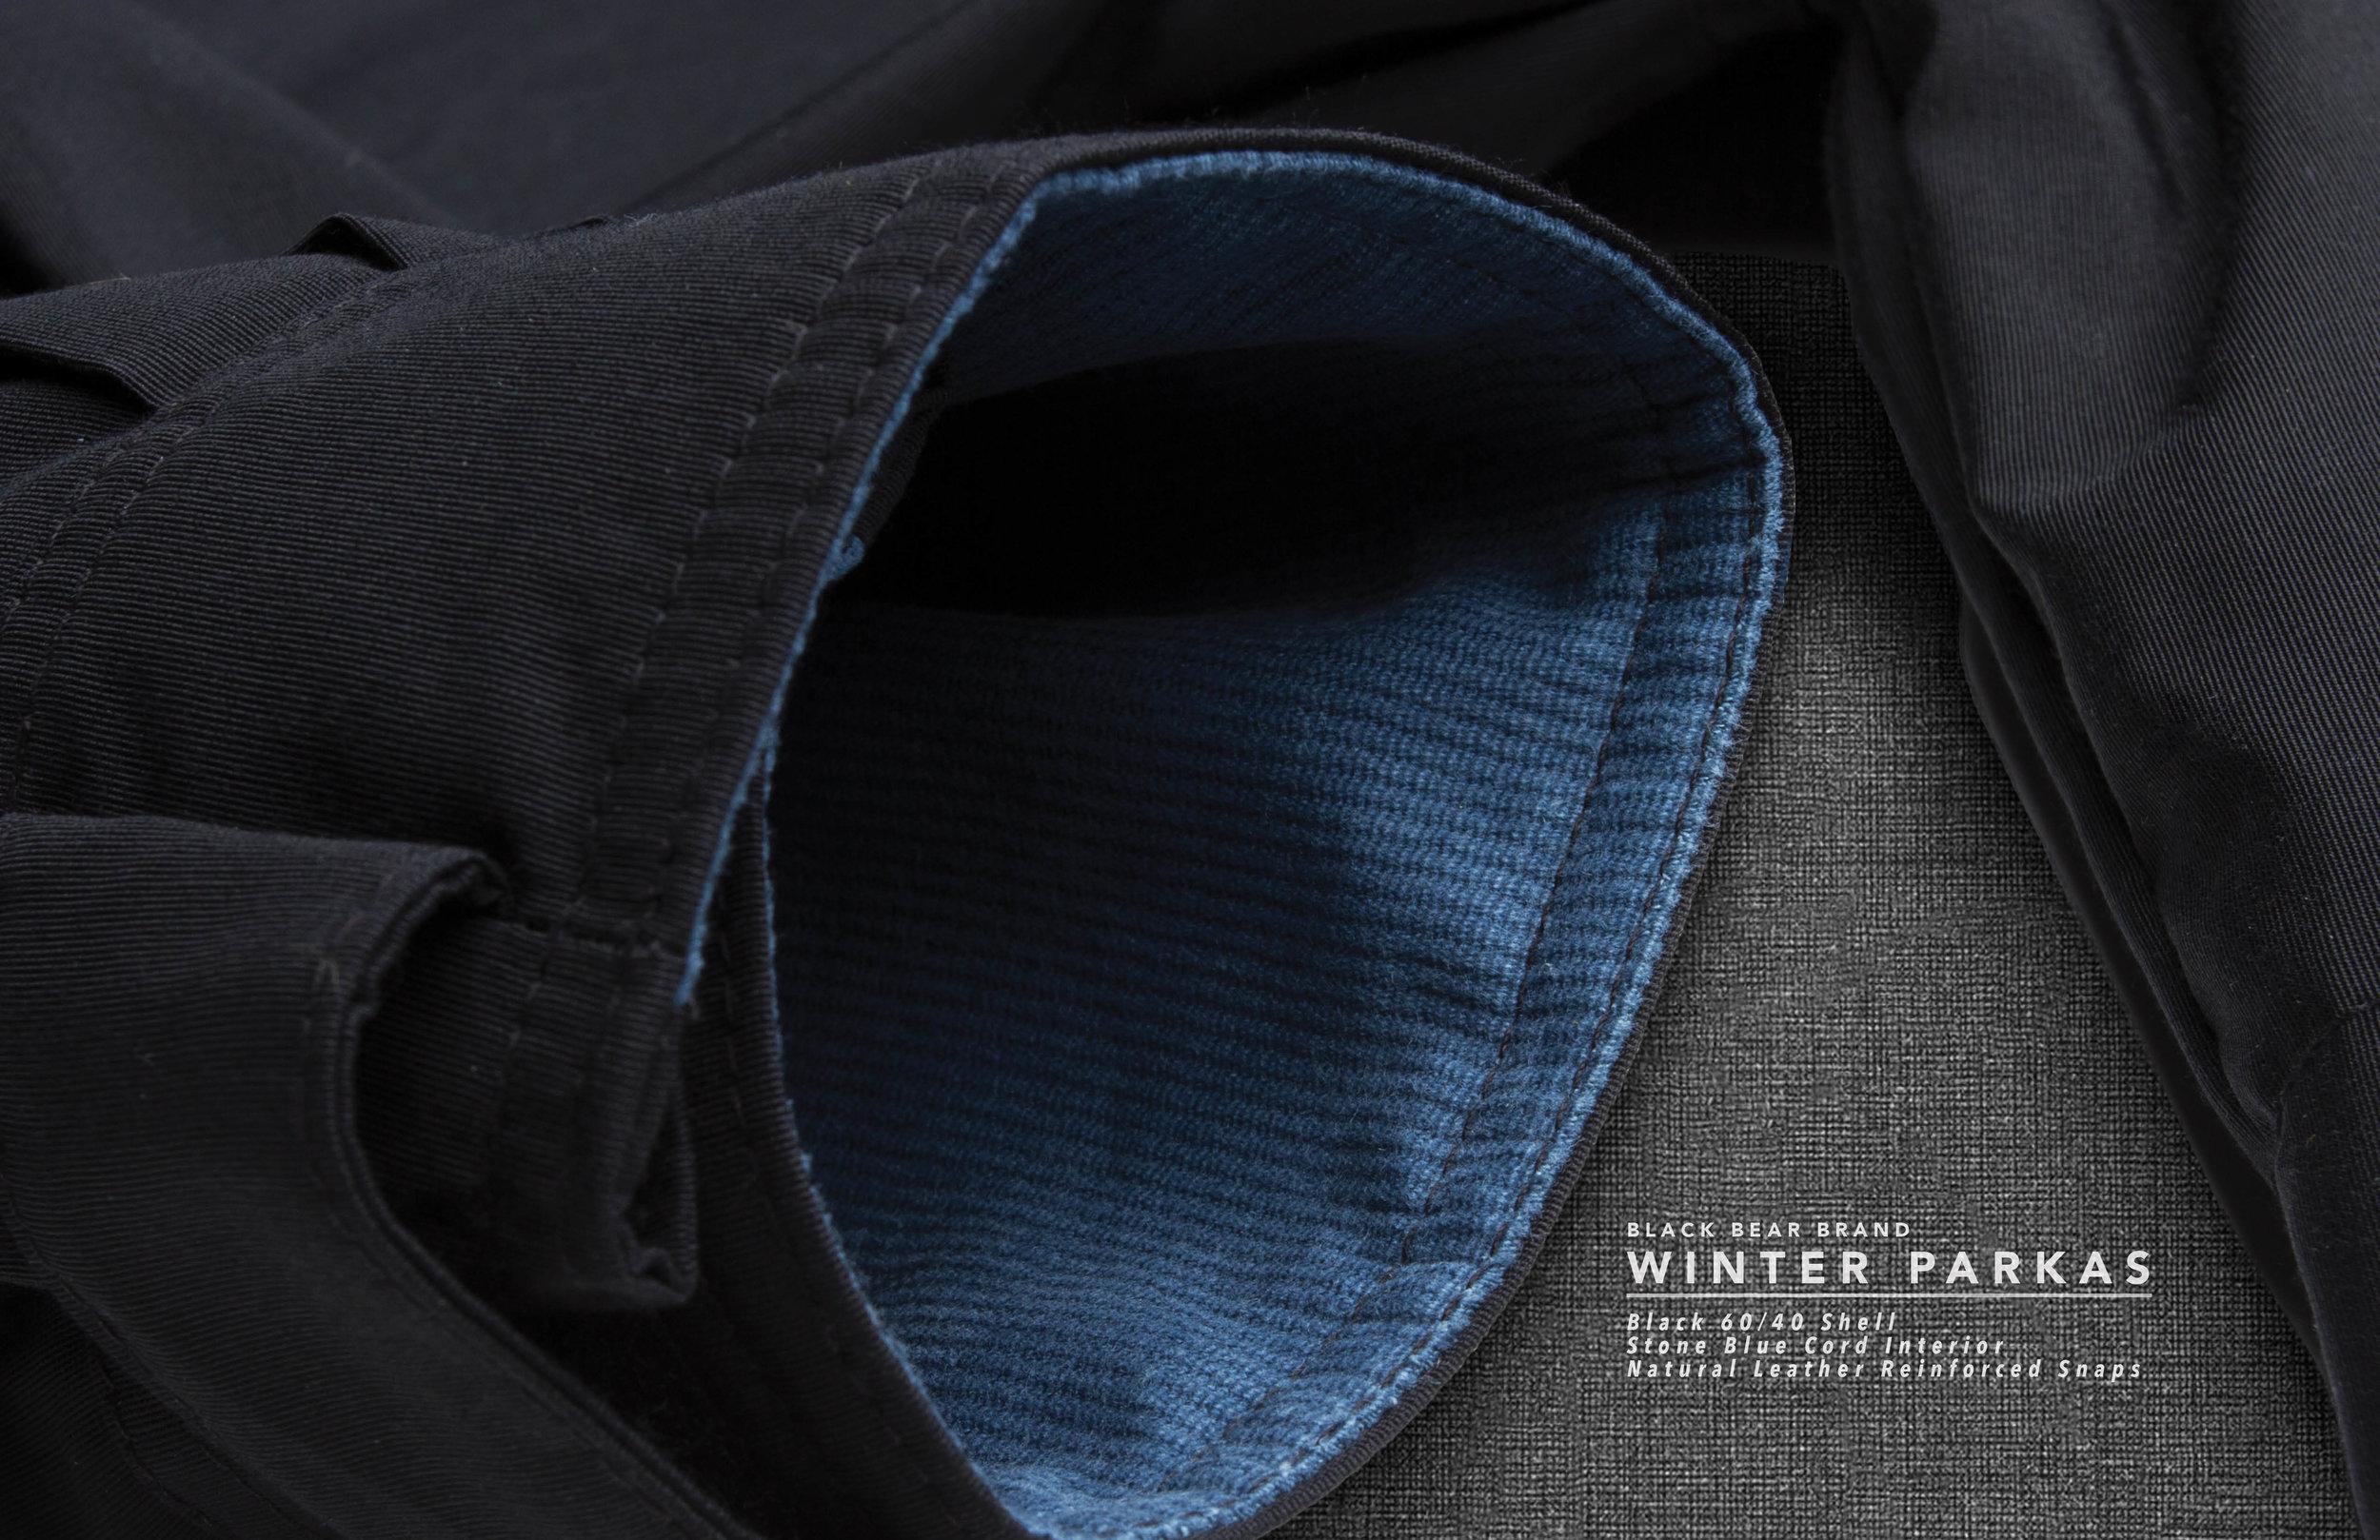 Black Bear Brand parka with stone blue corduroy liner